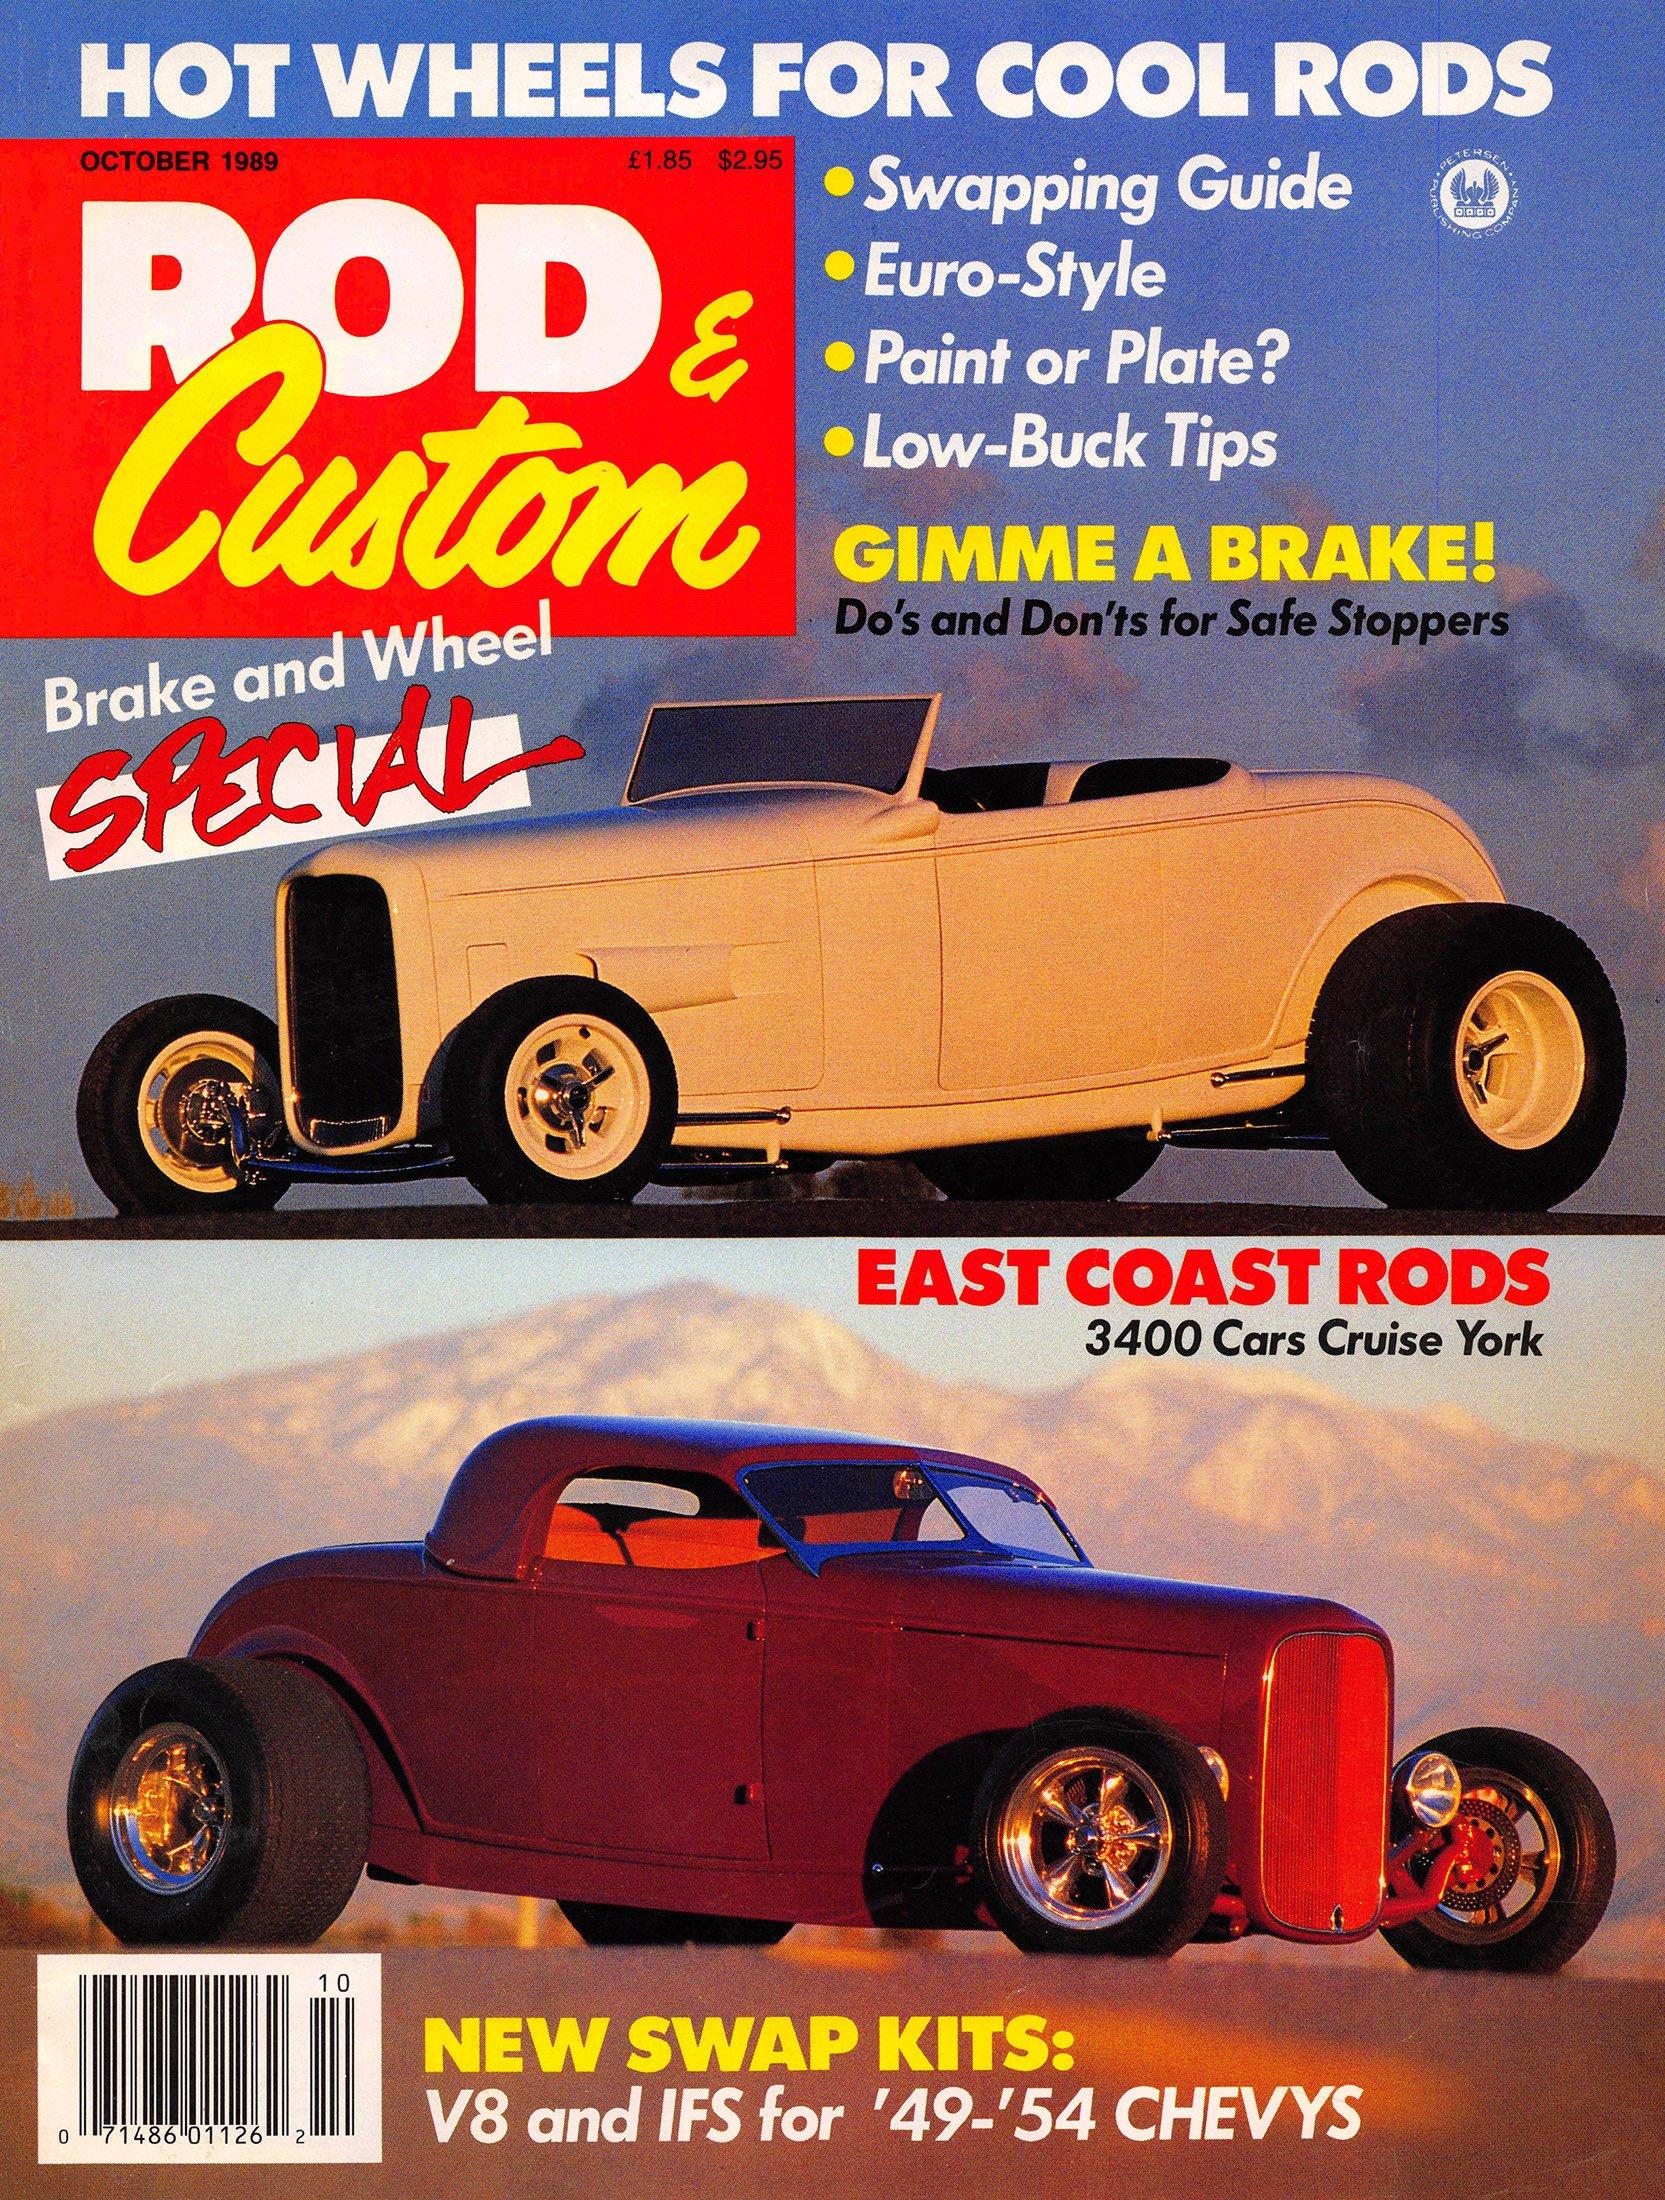 Rod & Custom Volume 23, Number 5 (October 1989)